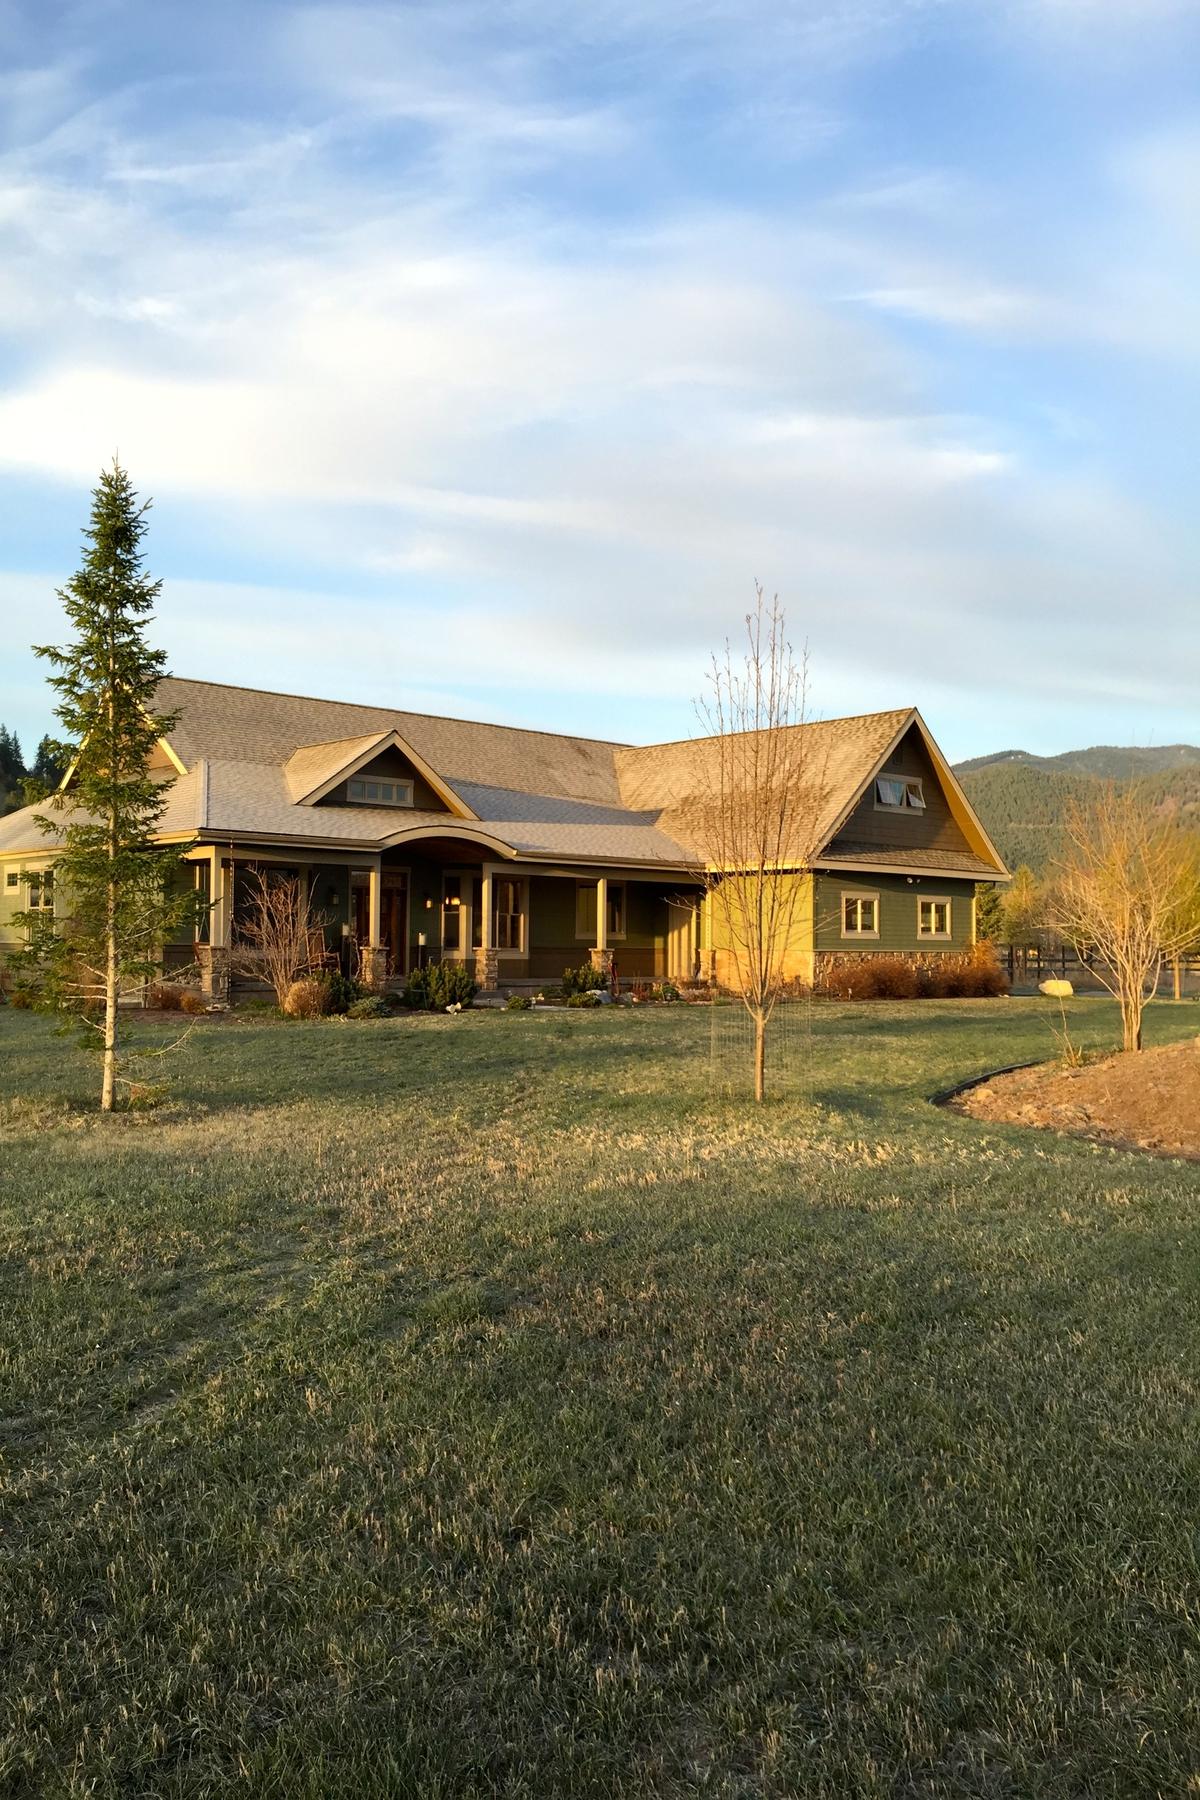 Villa per Vendita alle ore 2625 McCauley Lane Missoula, Montana 59804 Stati Uniti